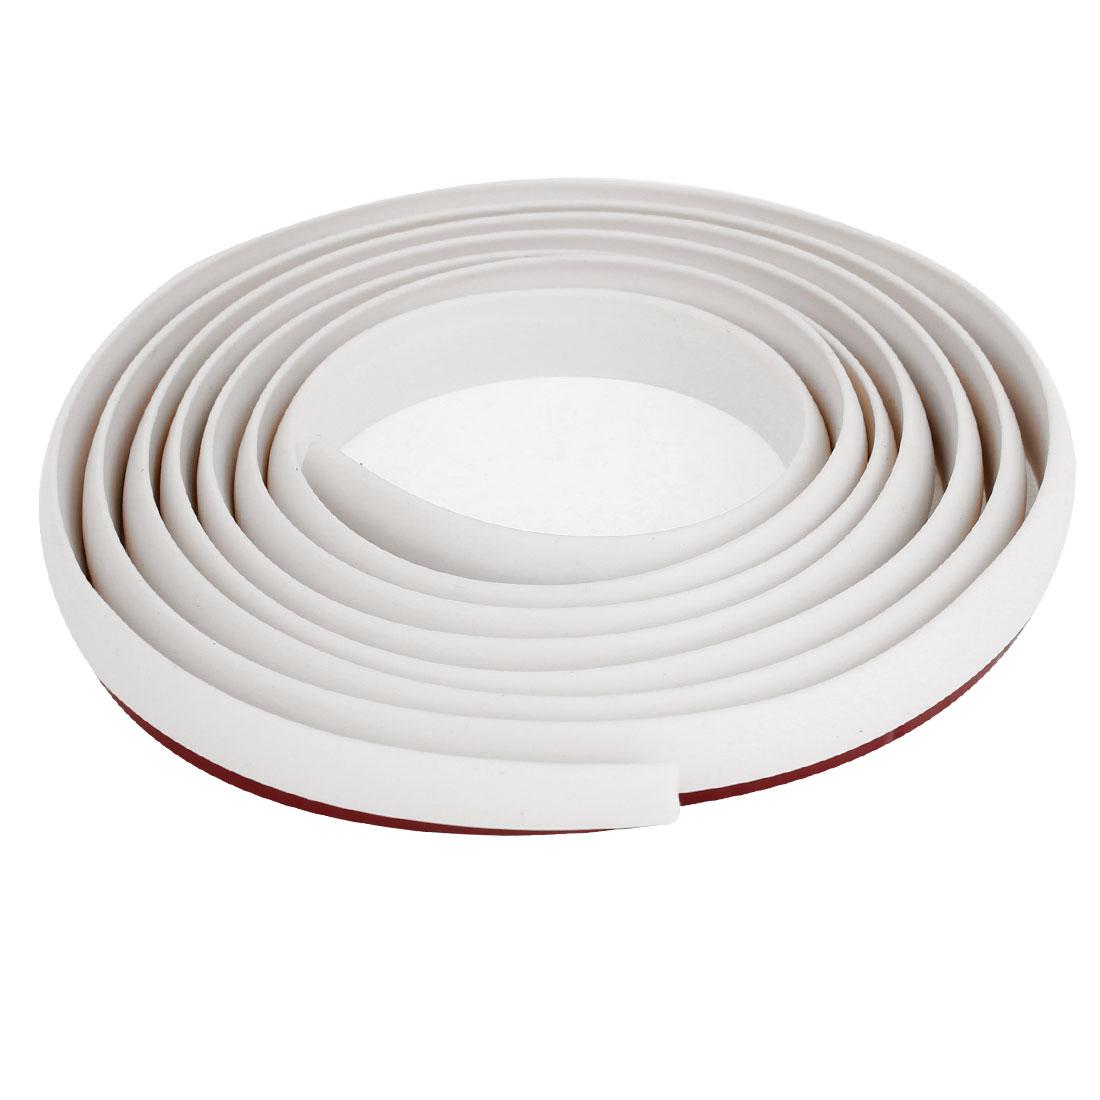 178cm Long White Rubber Flexible Strip Sticker Decor for Car